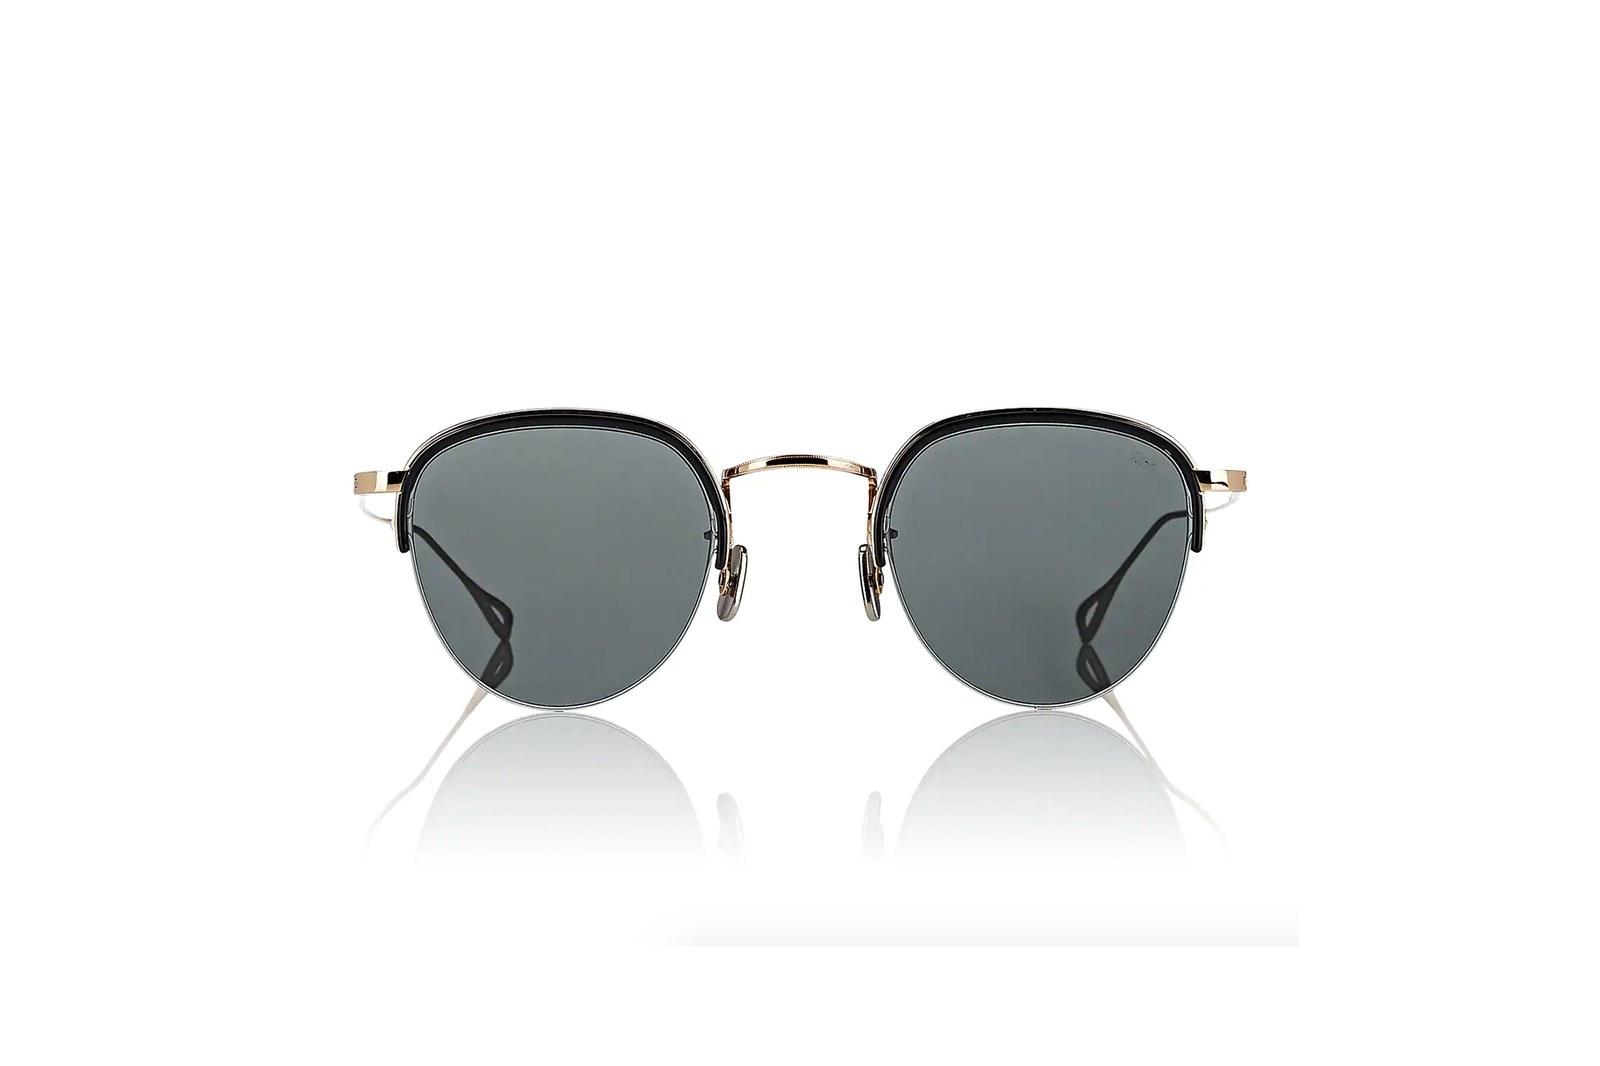 Kính eyevan 7285 Model 763 sunglasses